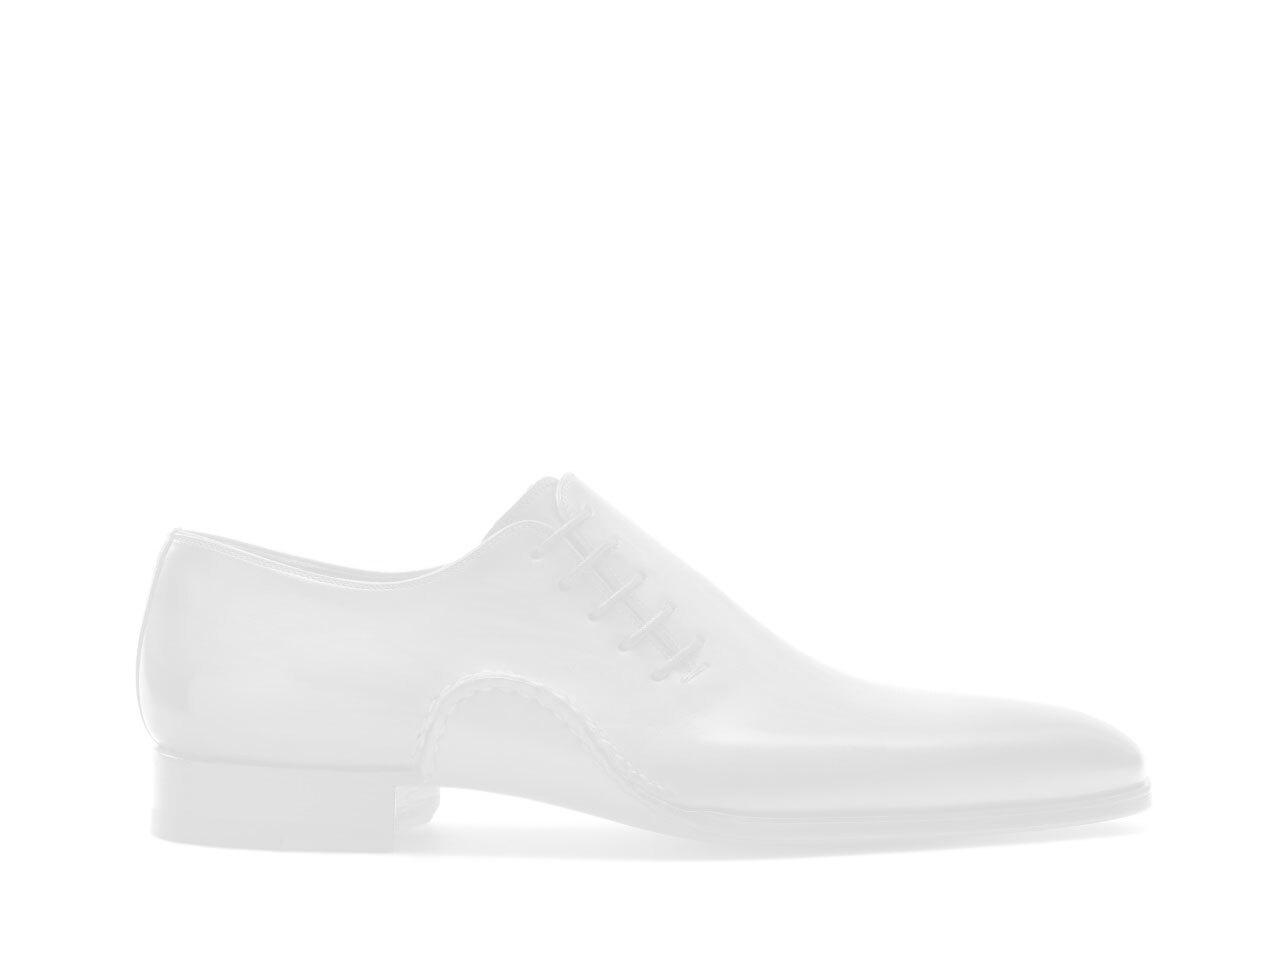 Black lizard lace up oxford shoes for men - Magnanni